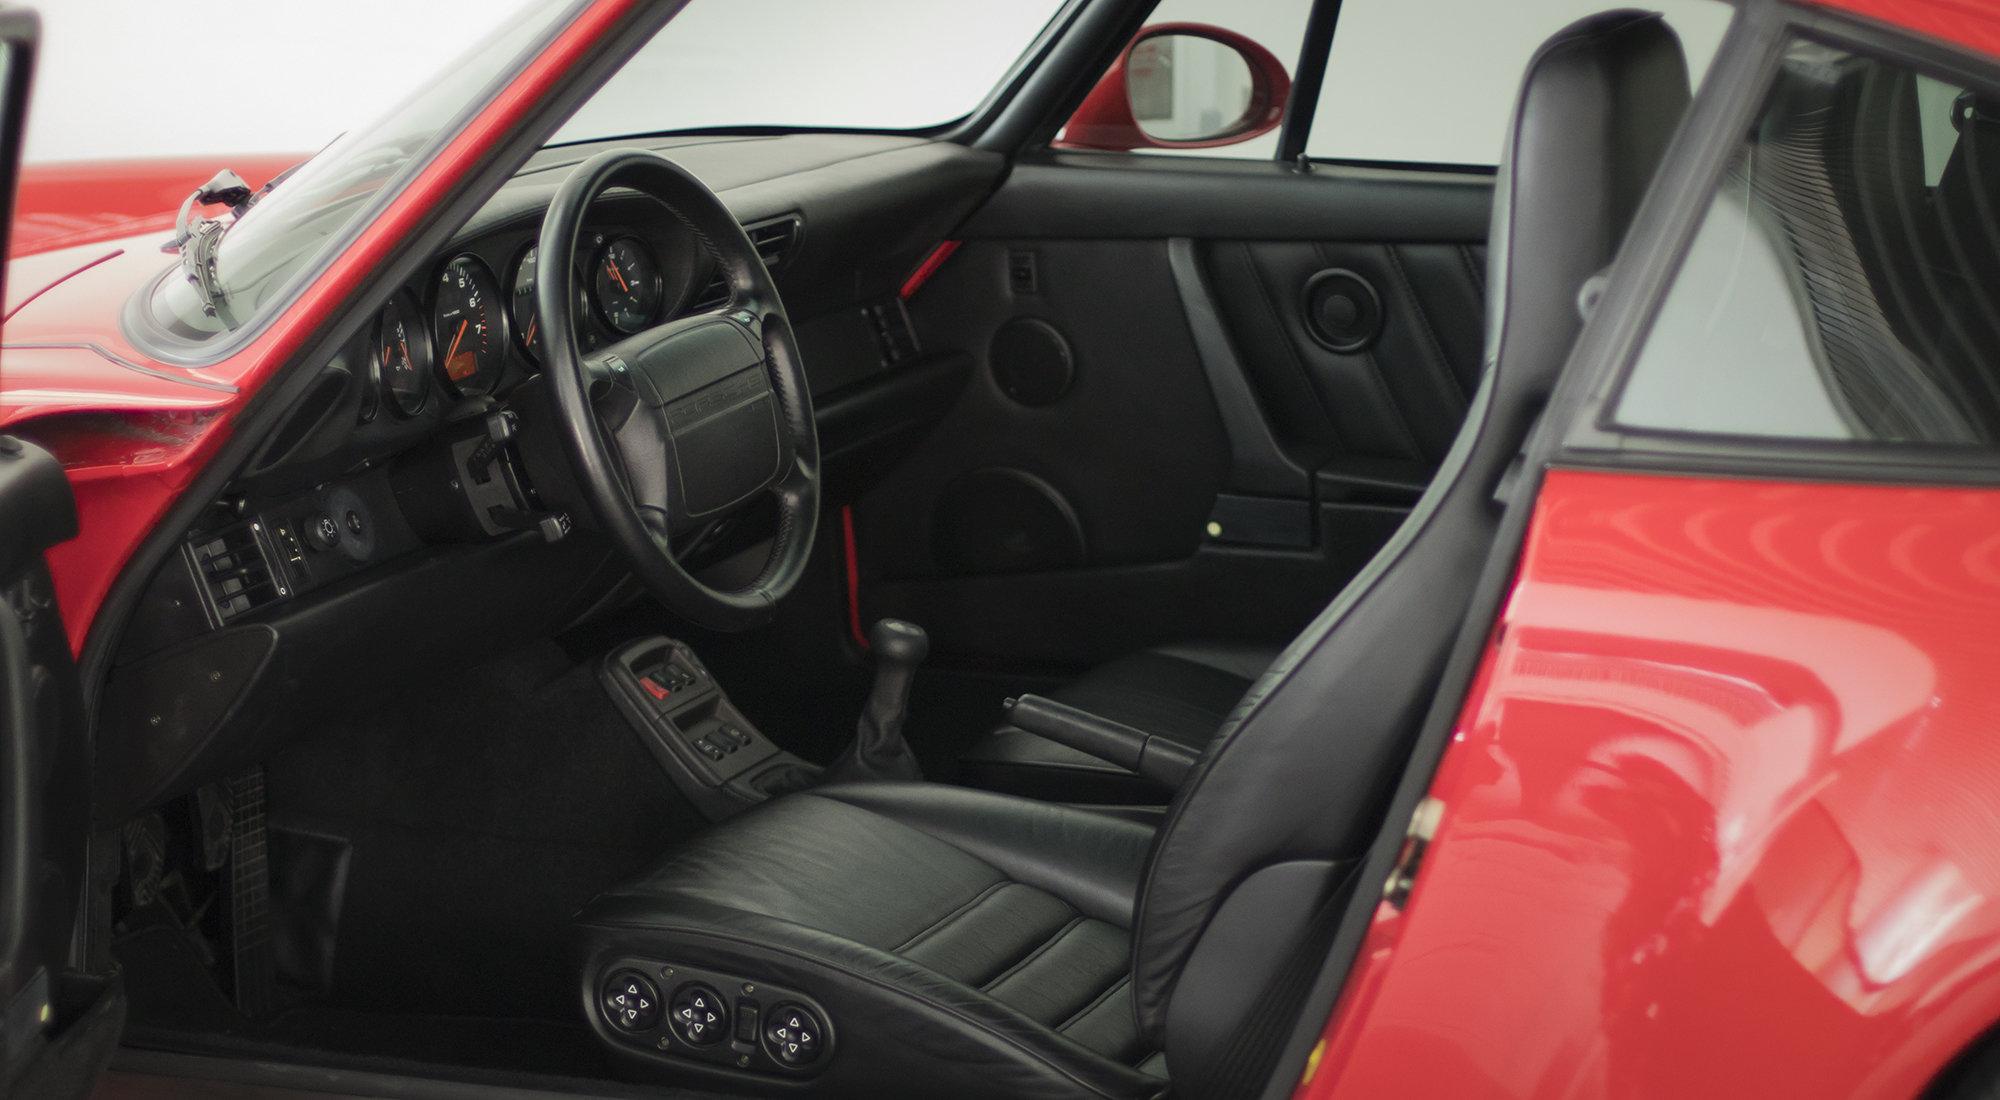 Porsche 964 Turbo 3.6 (1993) For Sale (picture 5 of 6)